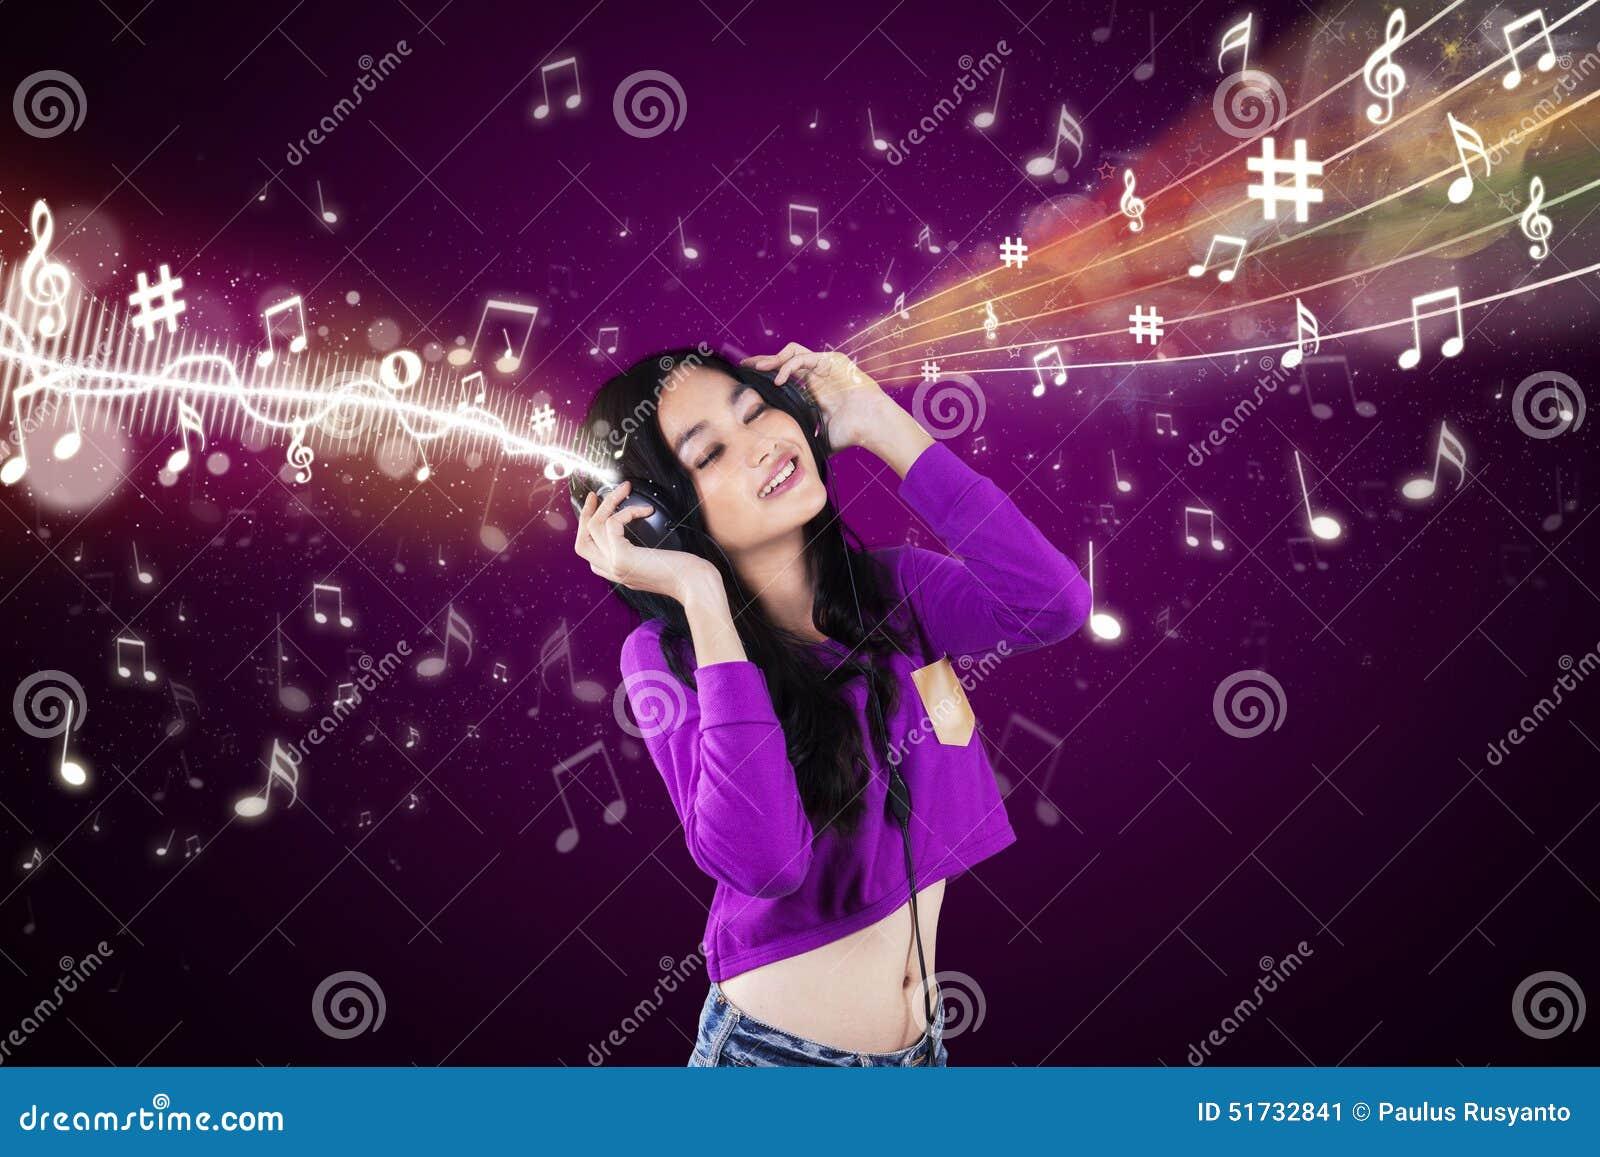 dj enjoy music with purple background stock illustration